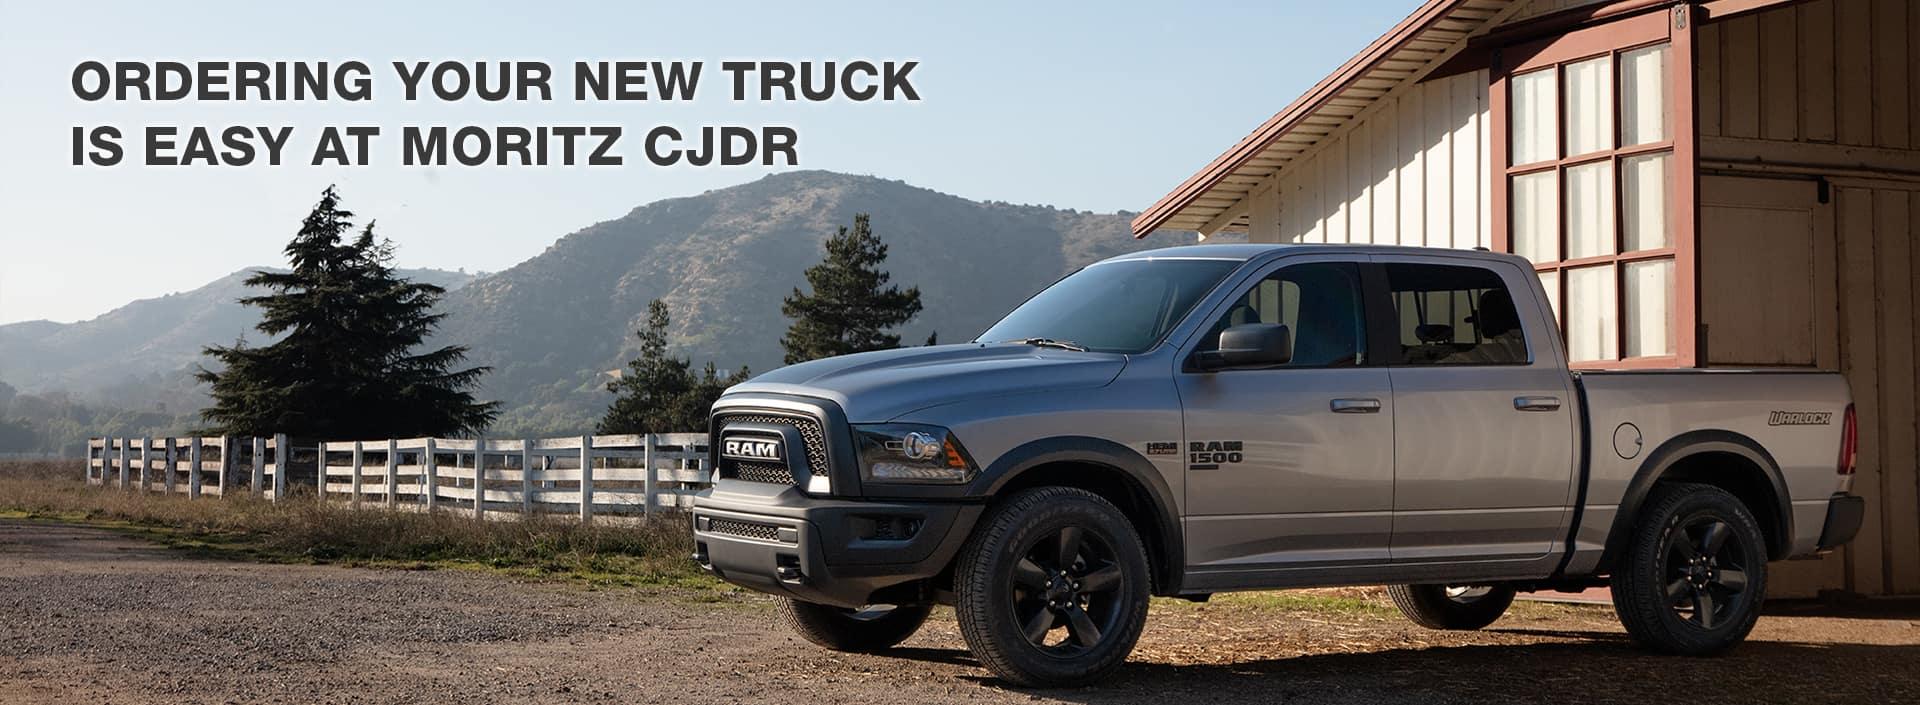 Order Your New Truck at Moritz Chrysler Dodge Jeep RAM!